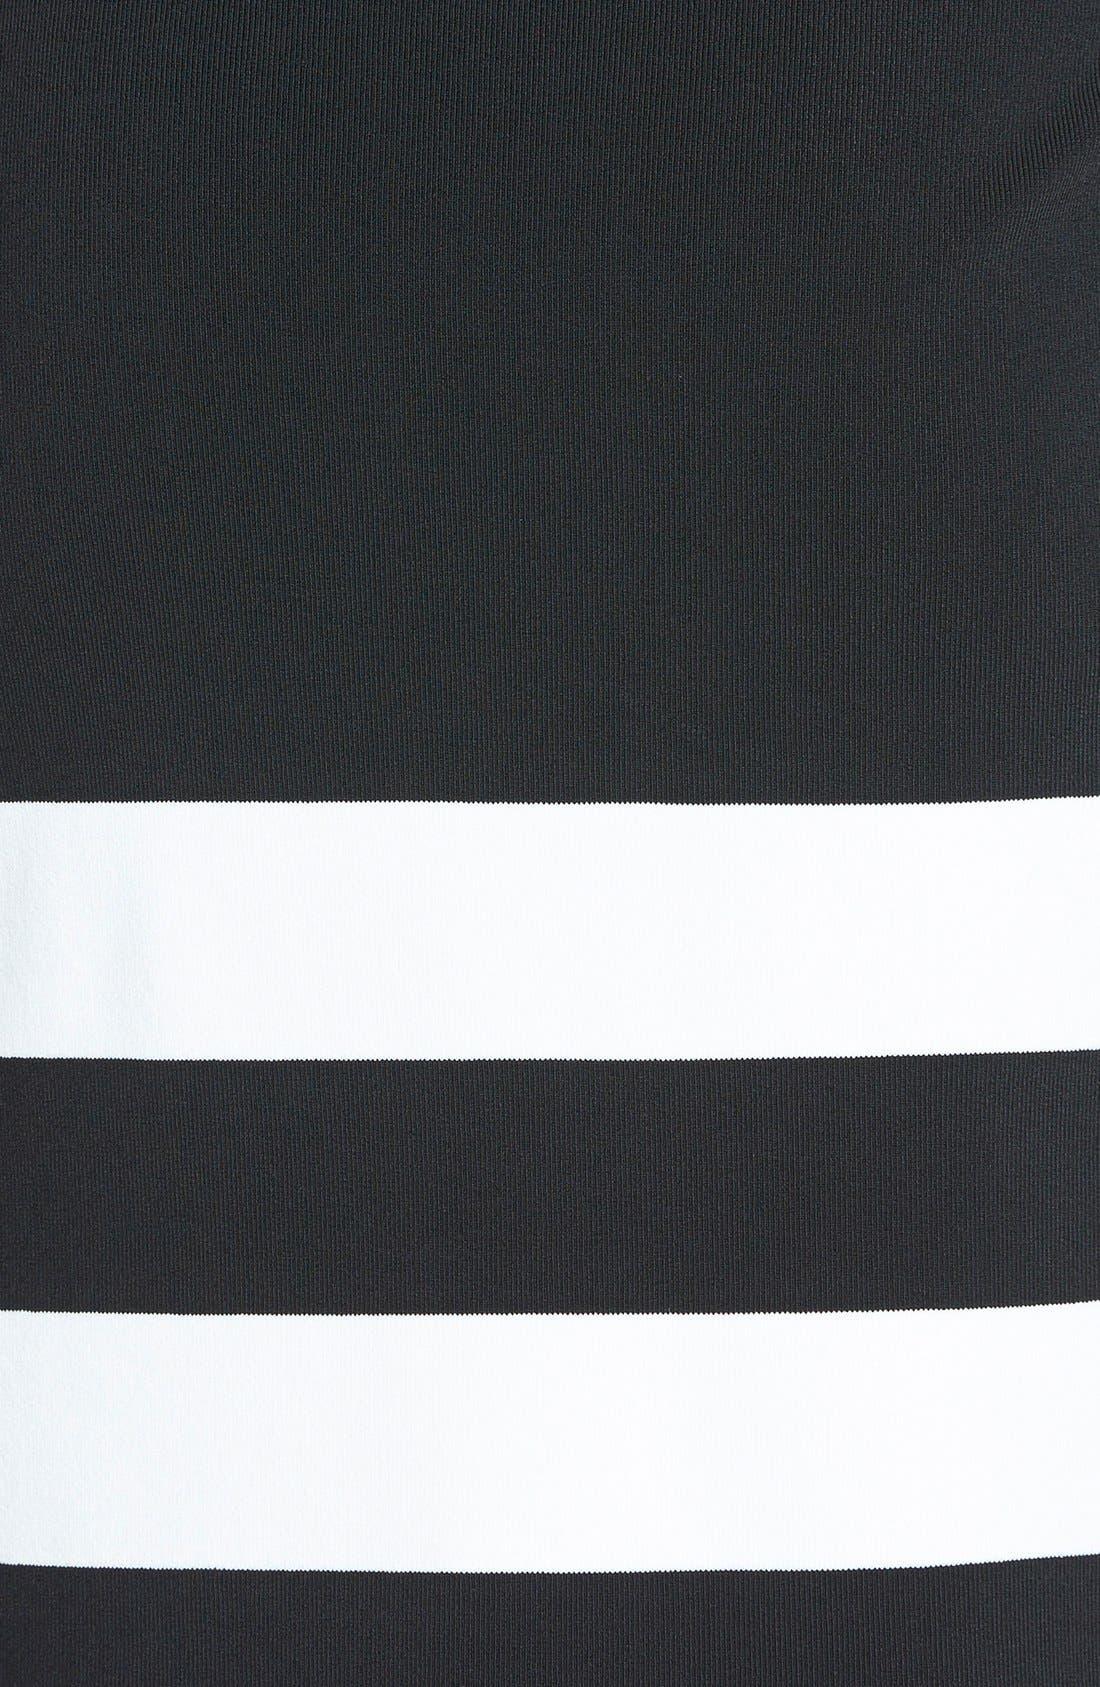 Sleeveless Mock Turtleneck Sweater,                             Alternate thumbnail 4, color,                             001